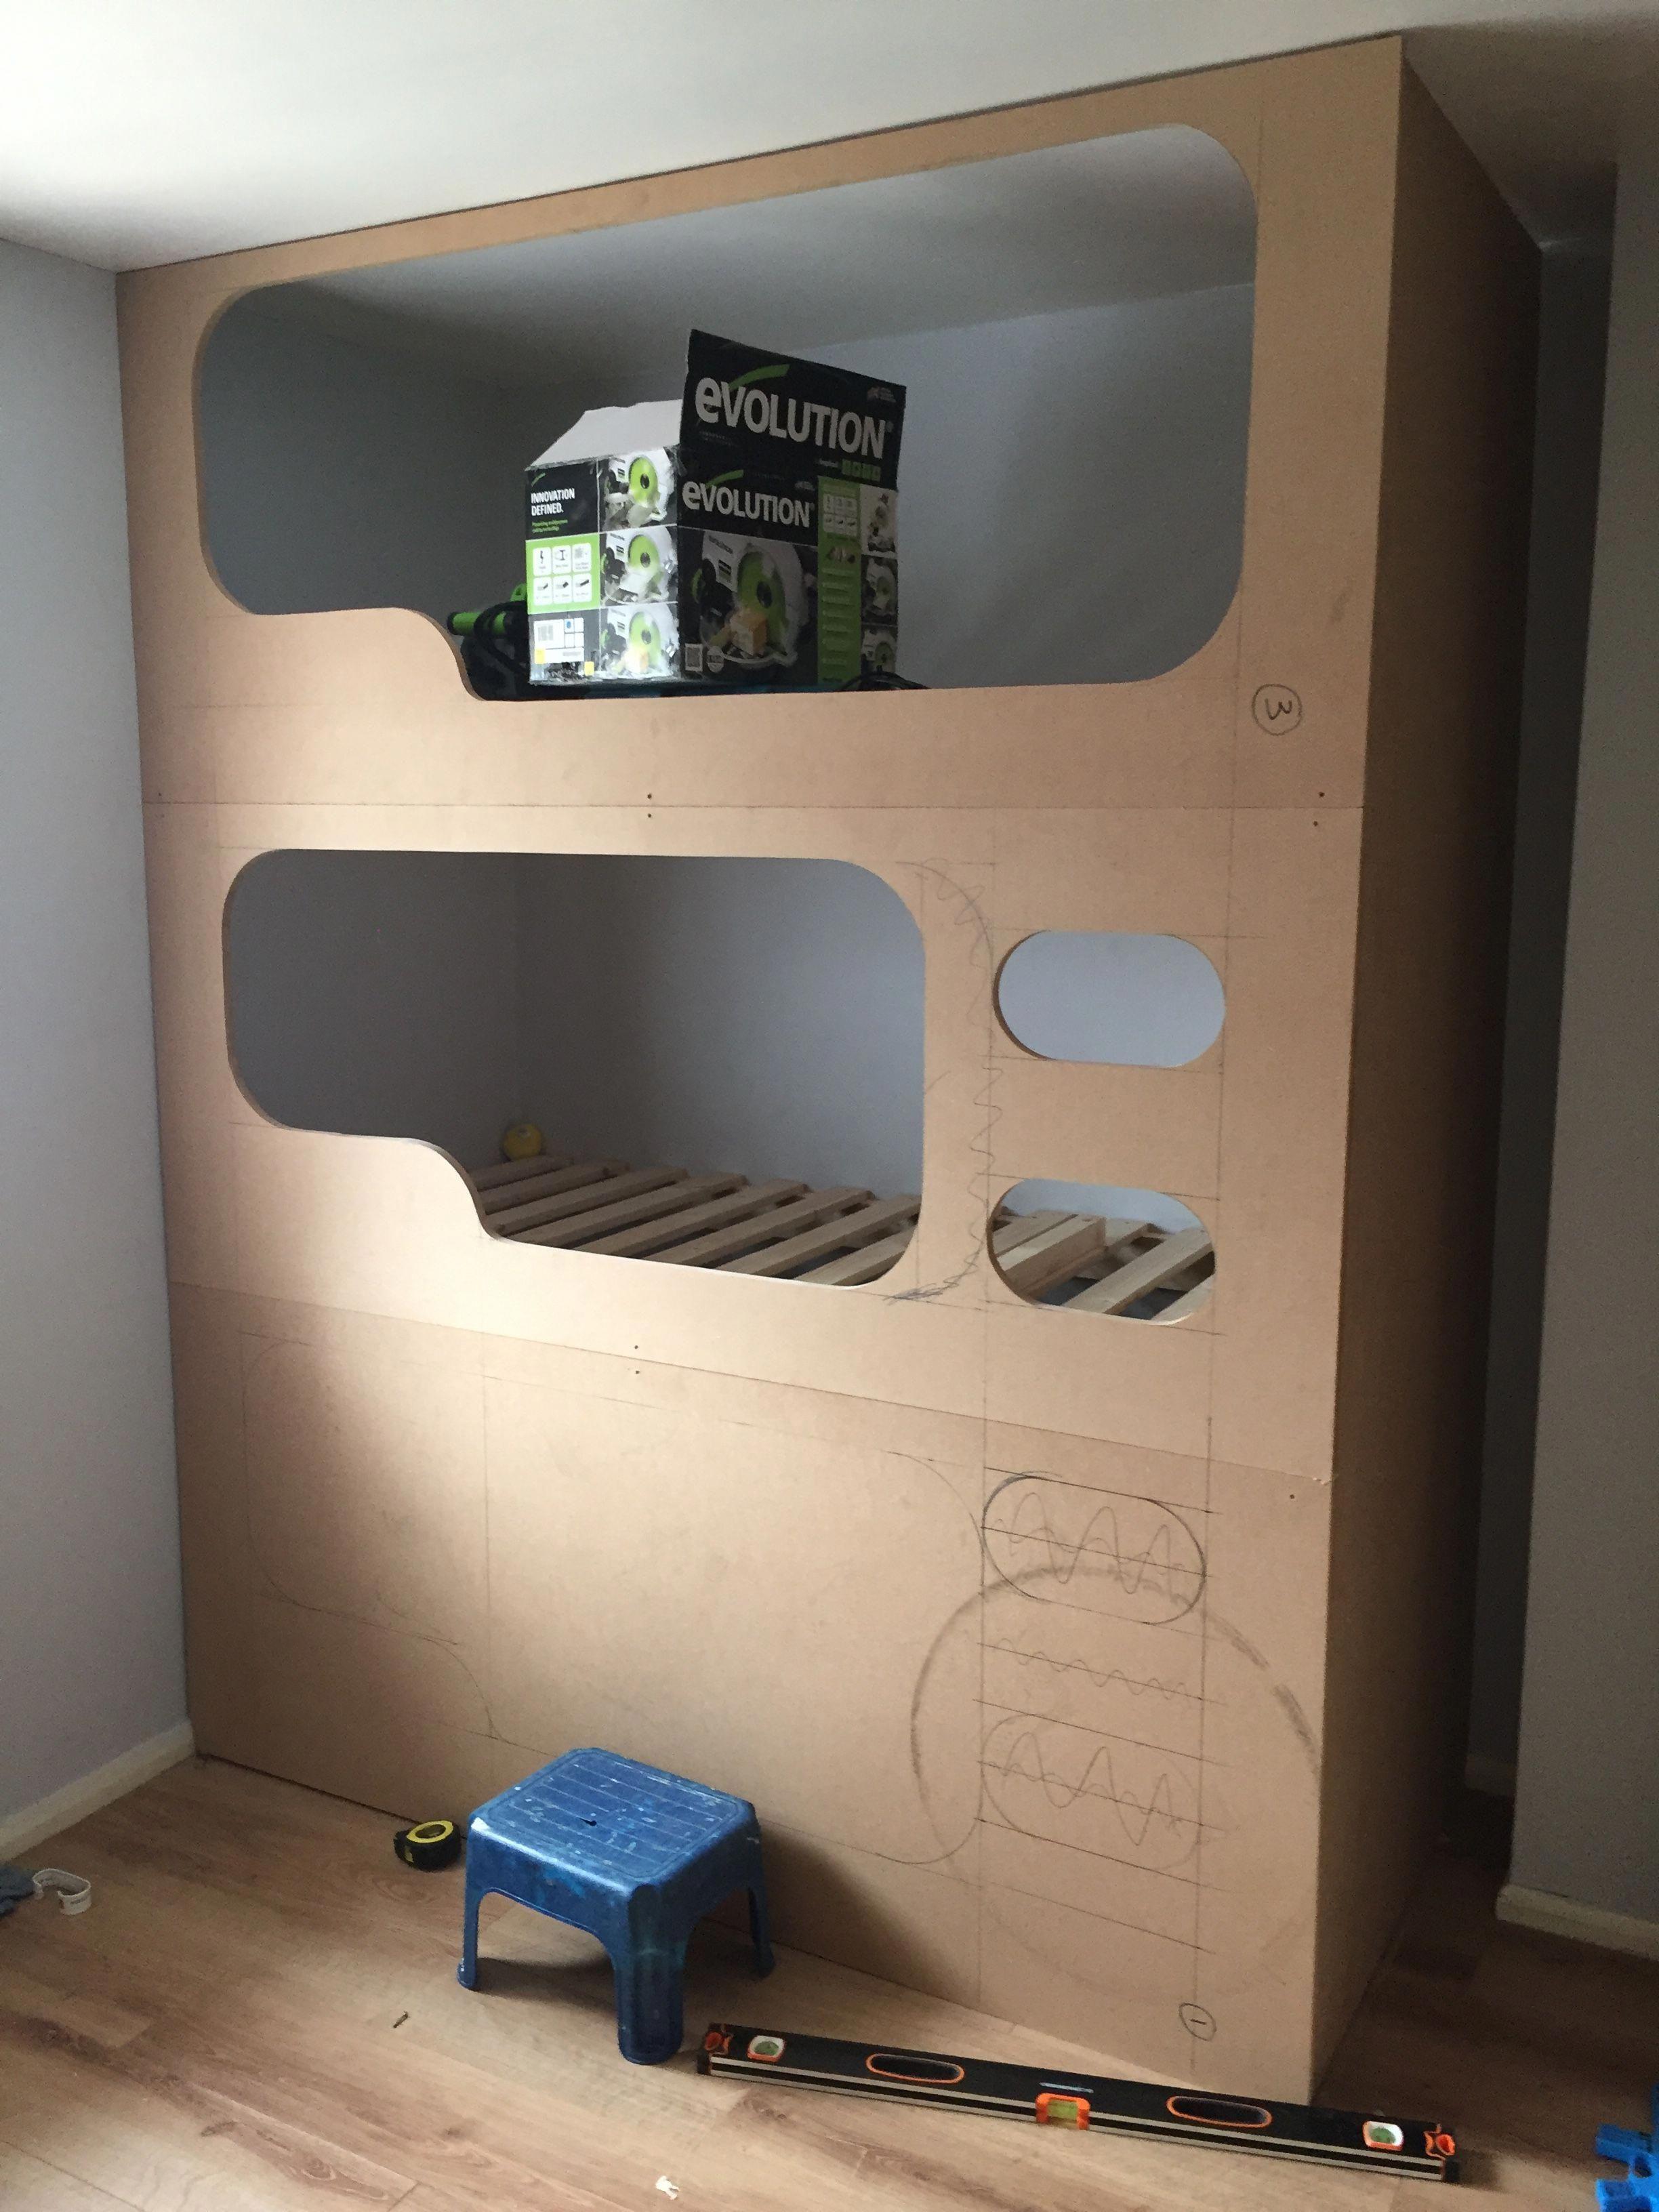 Loft bed ideas for low ceiling  DIY triple bunk bed udtriplebunkbedsforboysroomud  Triple Bunk Beds